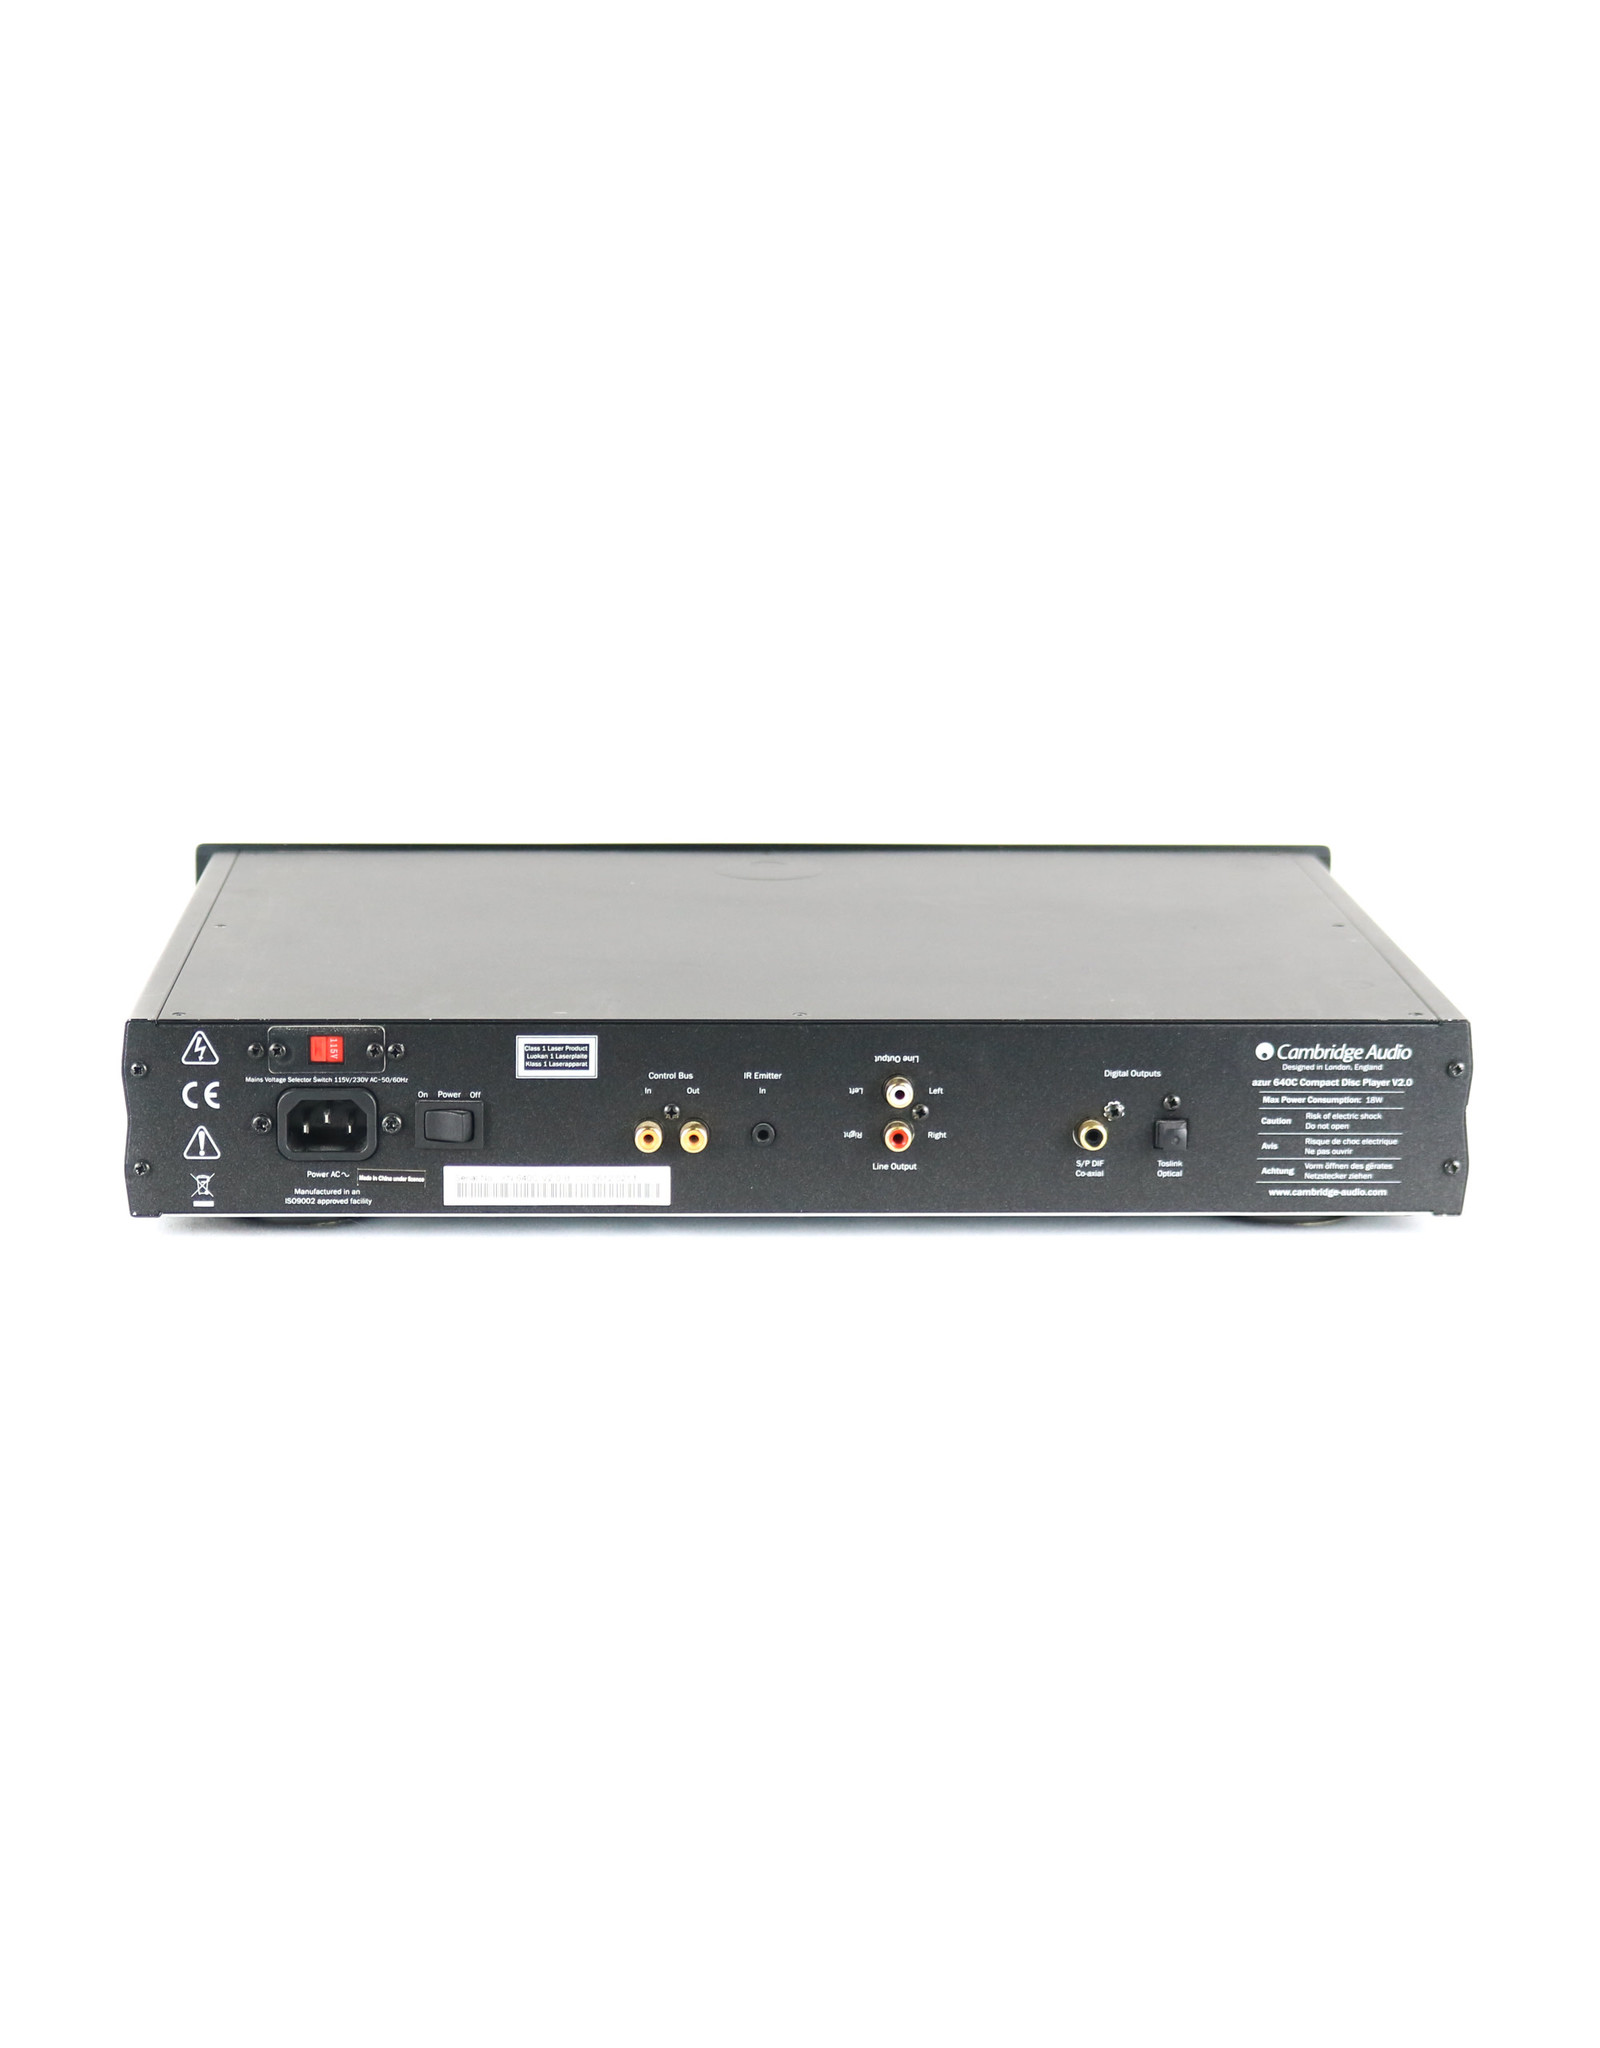 Cambridge Audio Cambridge 640C V2 CD Player Black USED